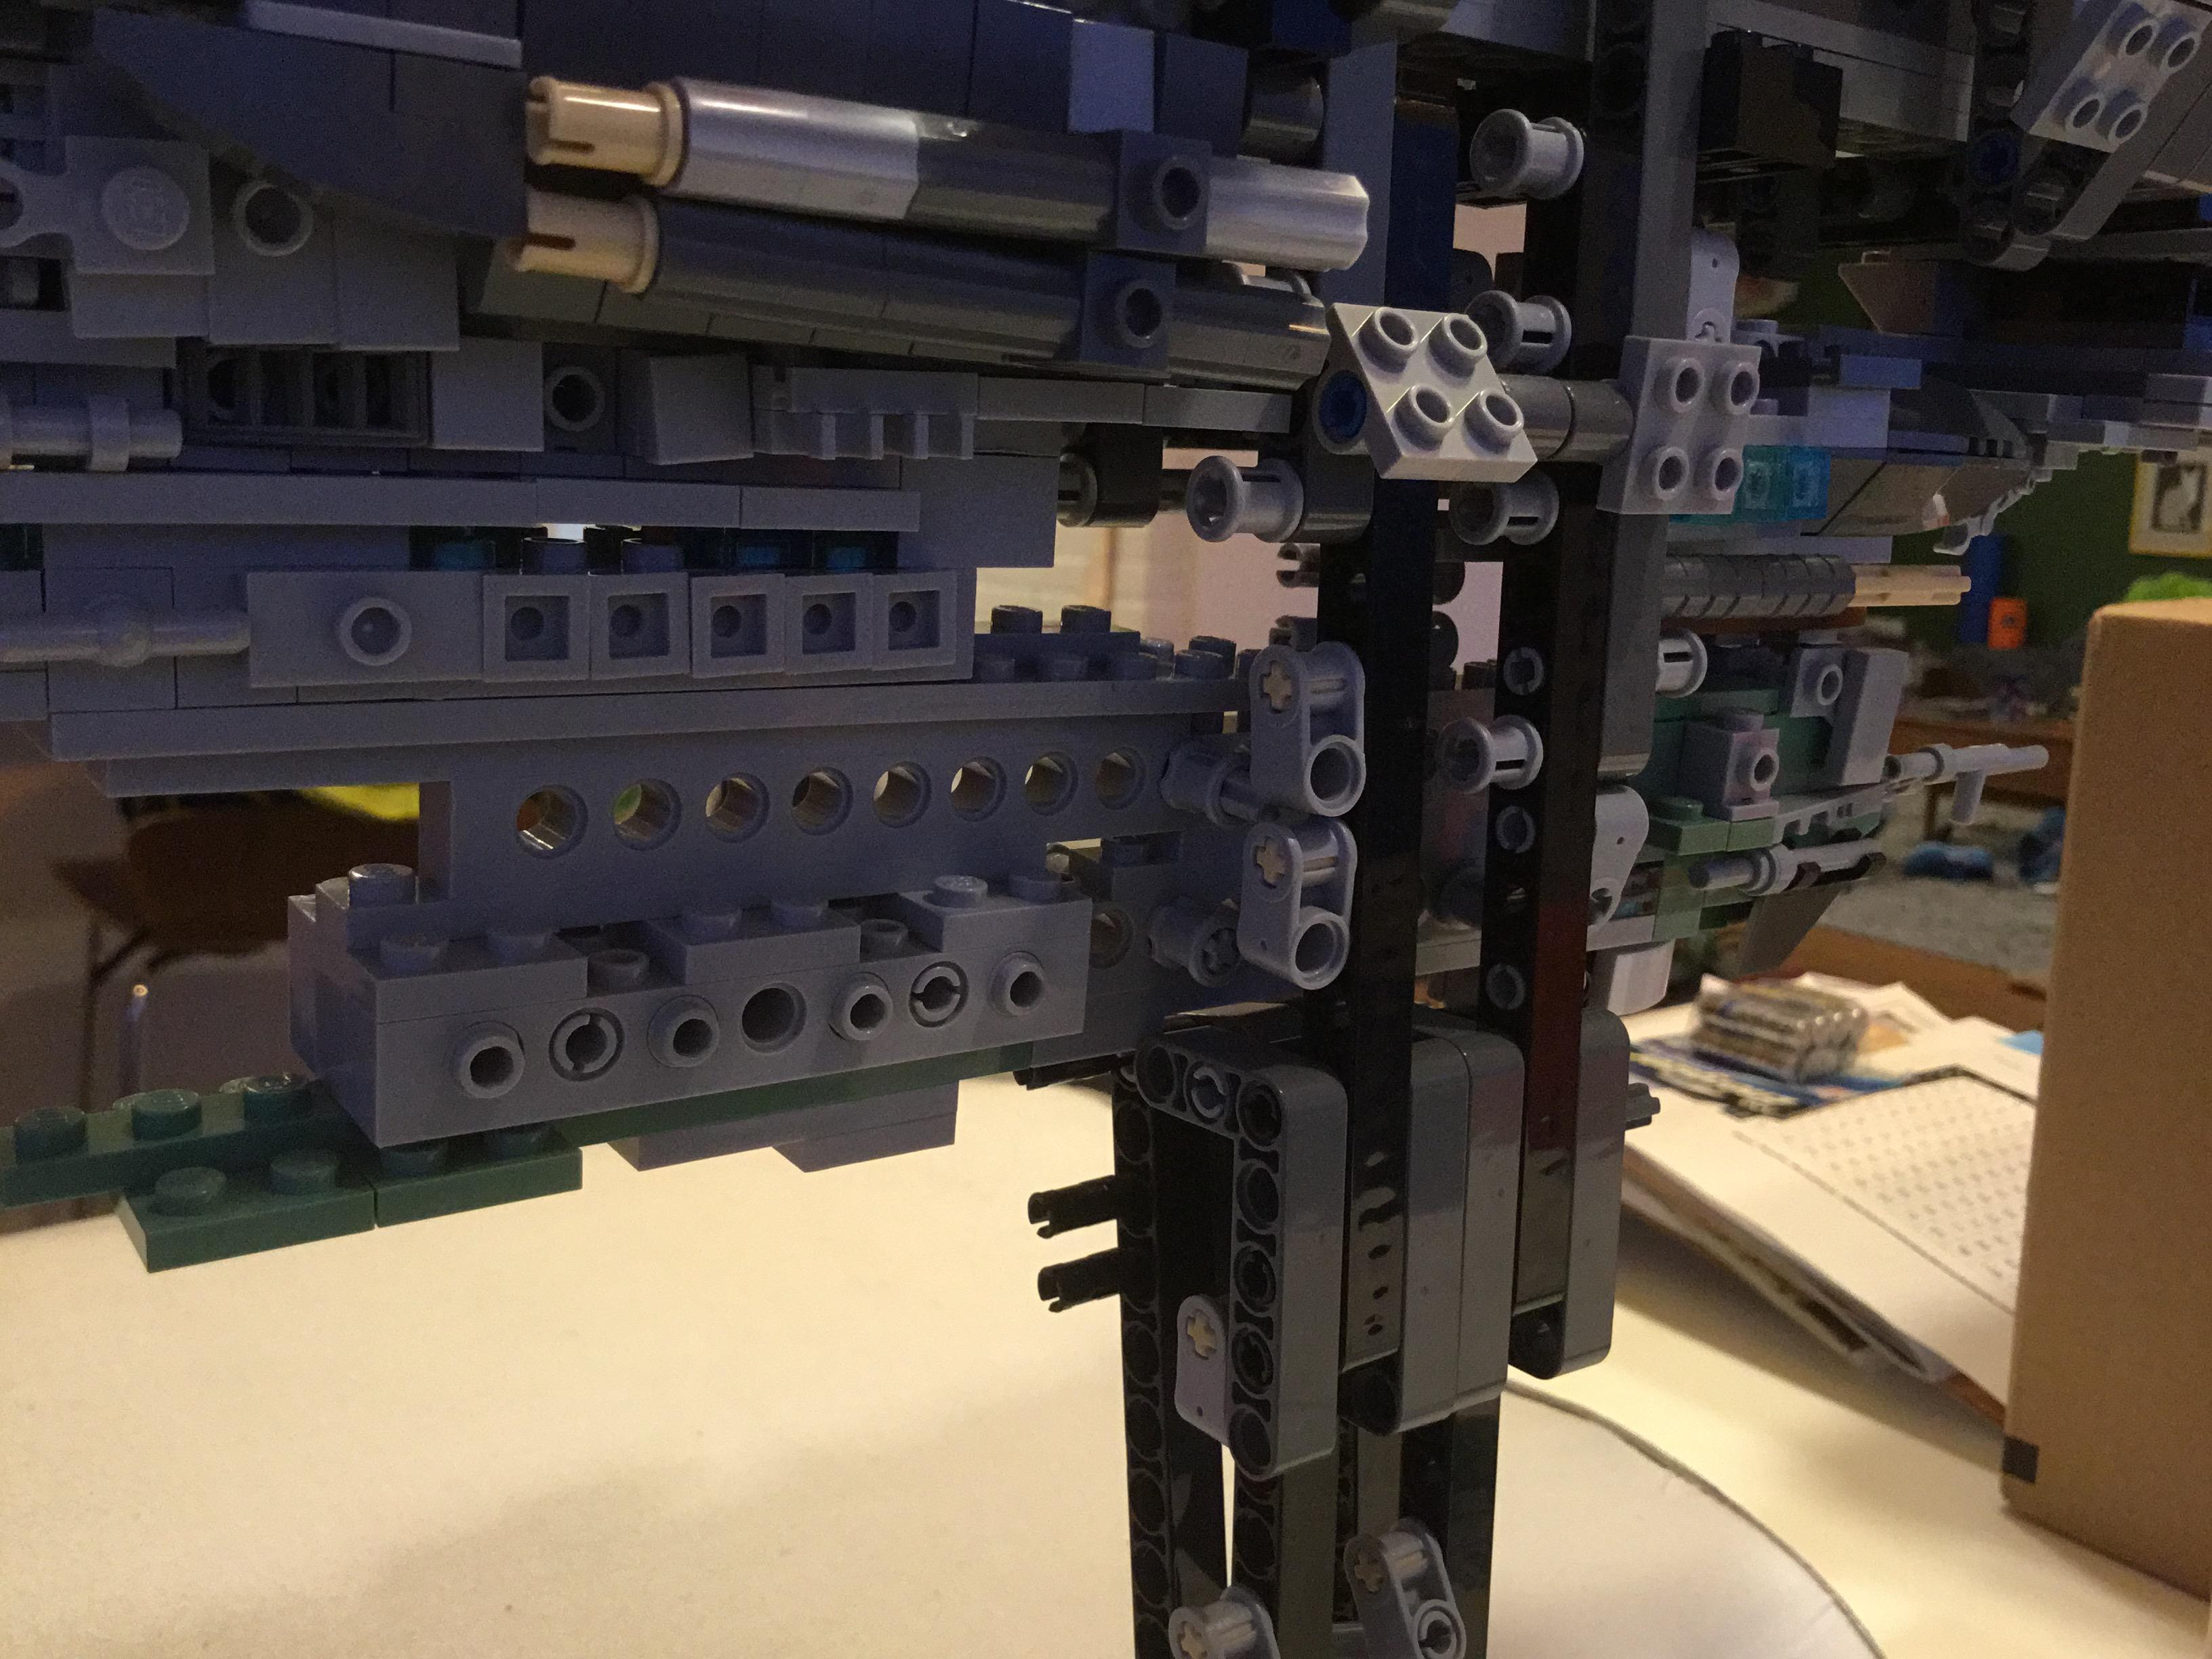 http://www.brickshelf.com/gallery/Ekae/Star-Wars-Ships/img_1449.jpg